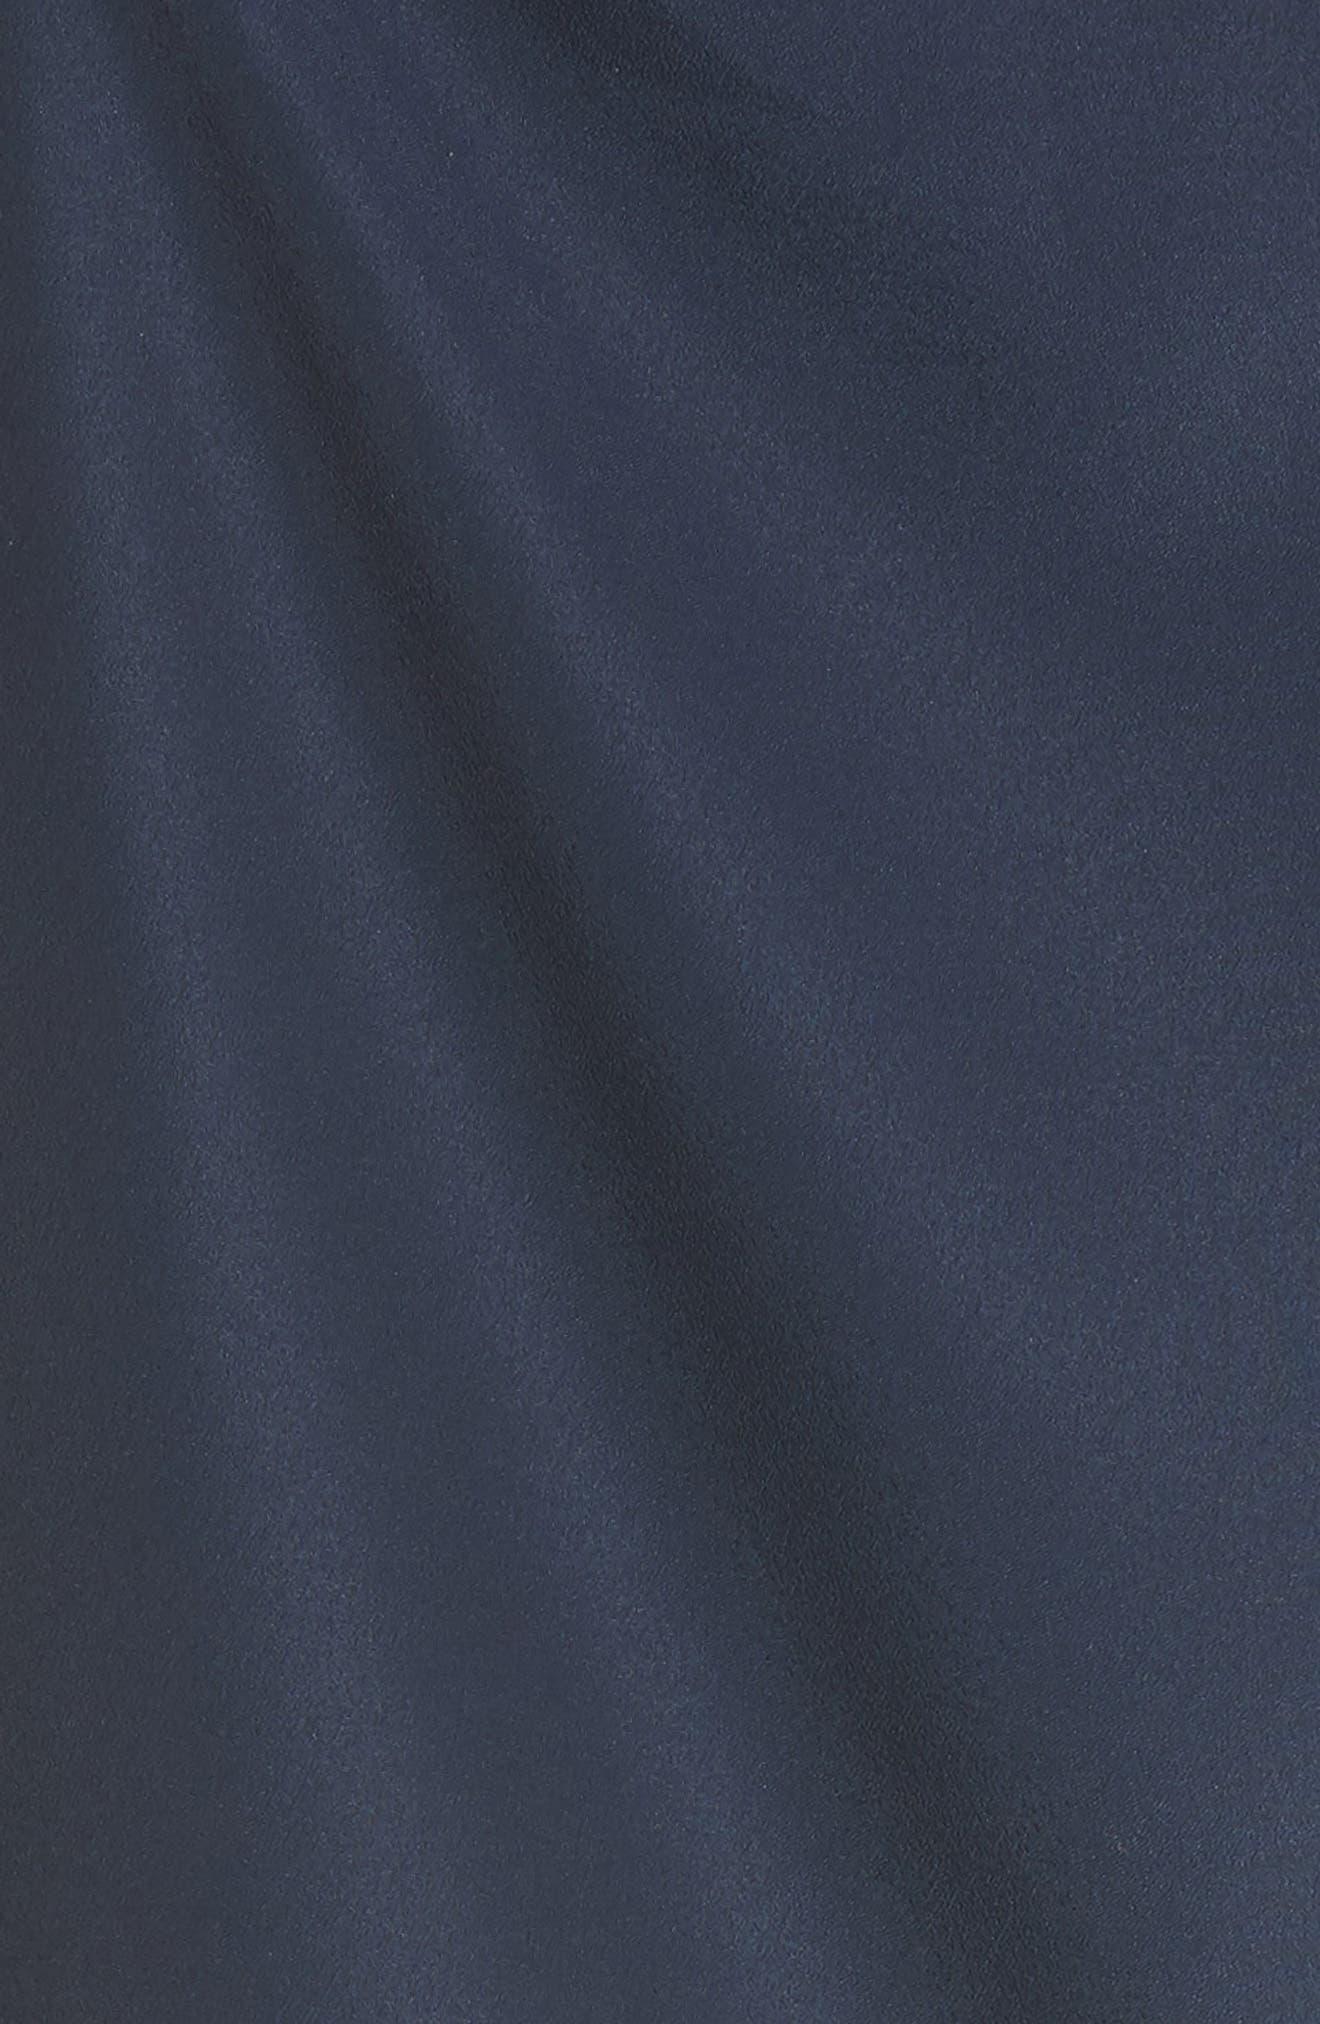 Edyte Asymmetrical Dress,                             Alternate thumbnail 4, color,                             Dark Navy